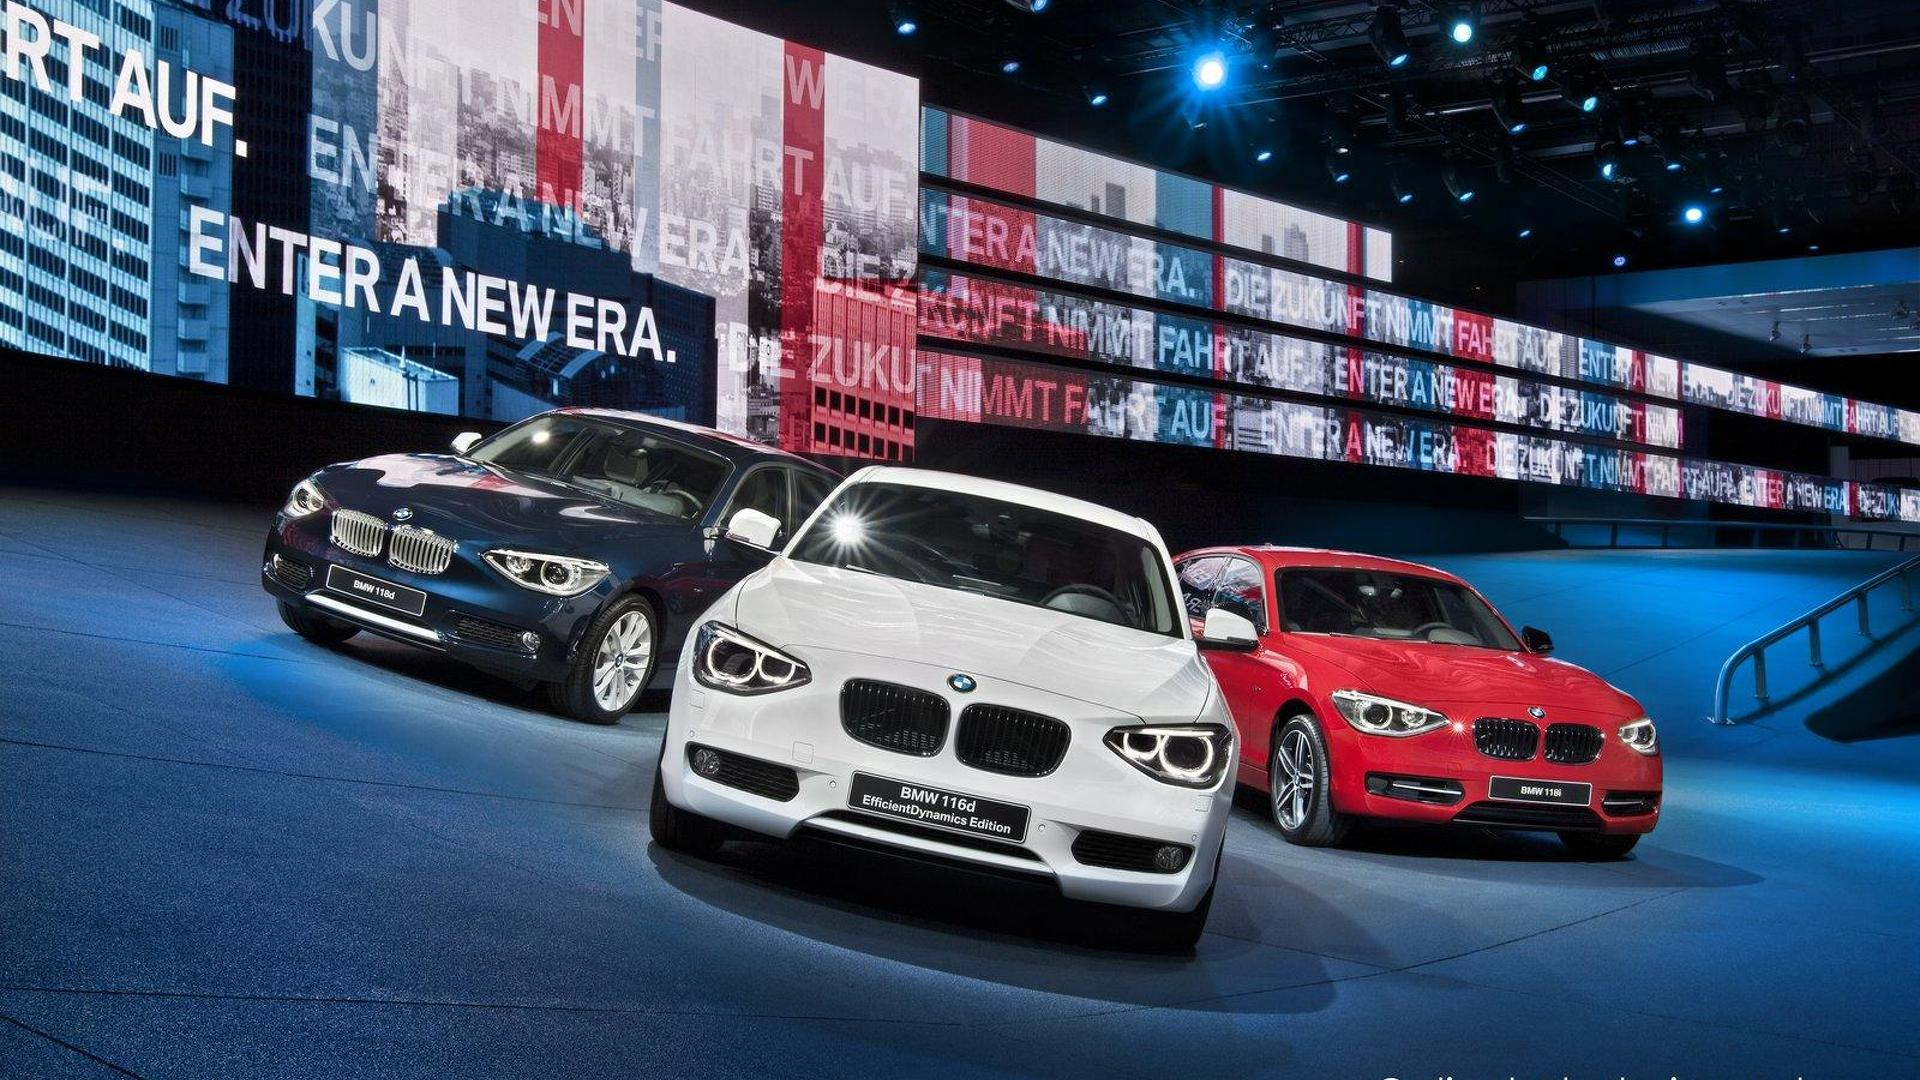 BMW previews its 2011 Frankfurt show